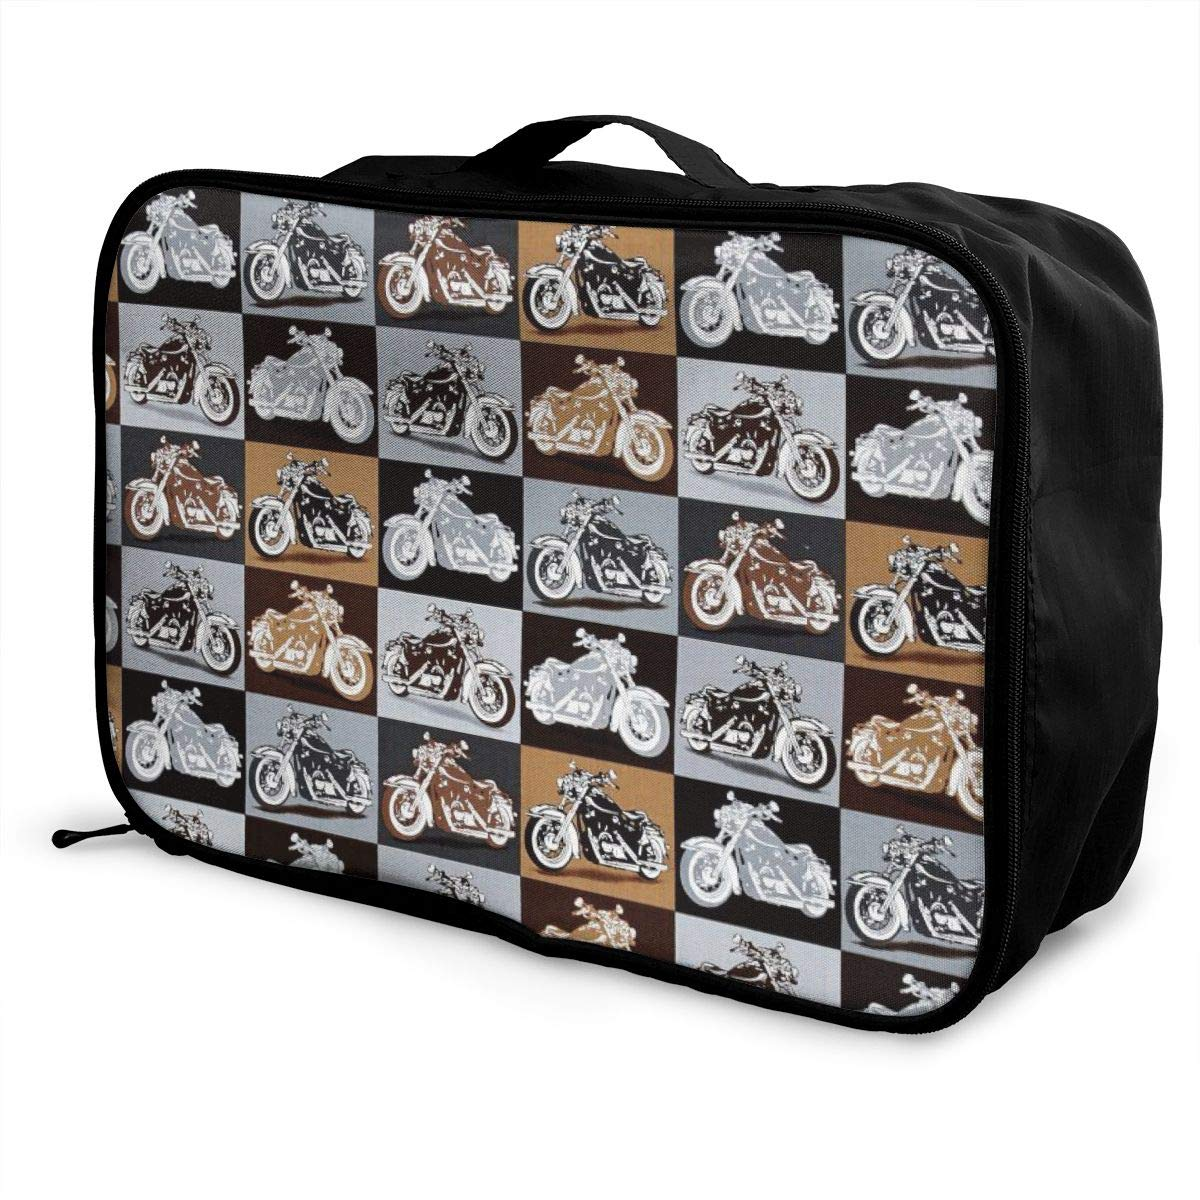 Biker For Life Motorcycle Travel Duffel Bag Casual Large Capacity Portable Luggage Bag Suitcase Storage Bag Luggage Packing Tote Bag Weekend Trip